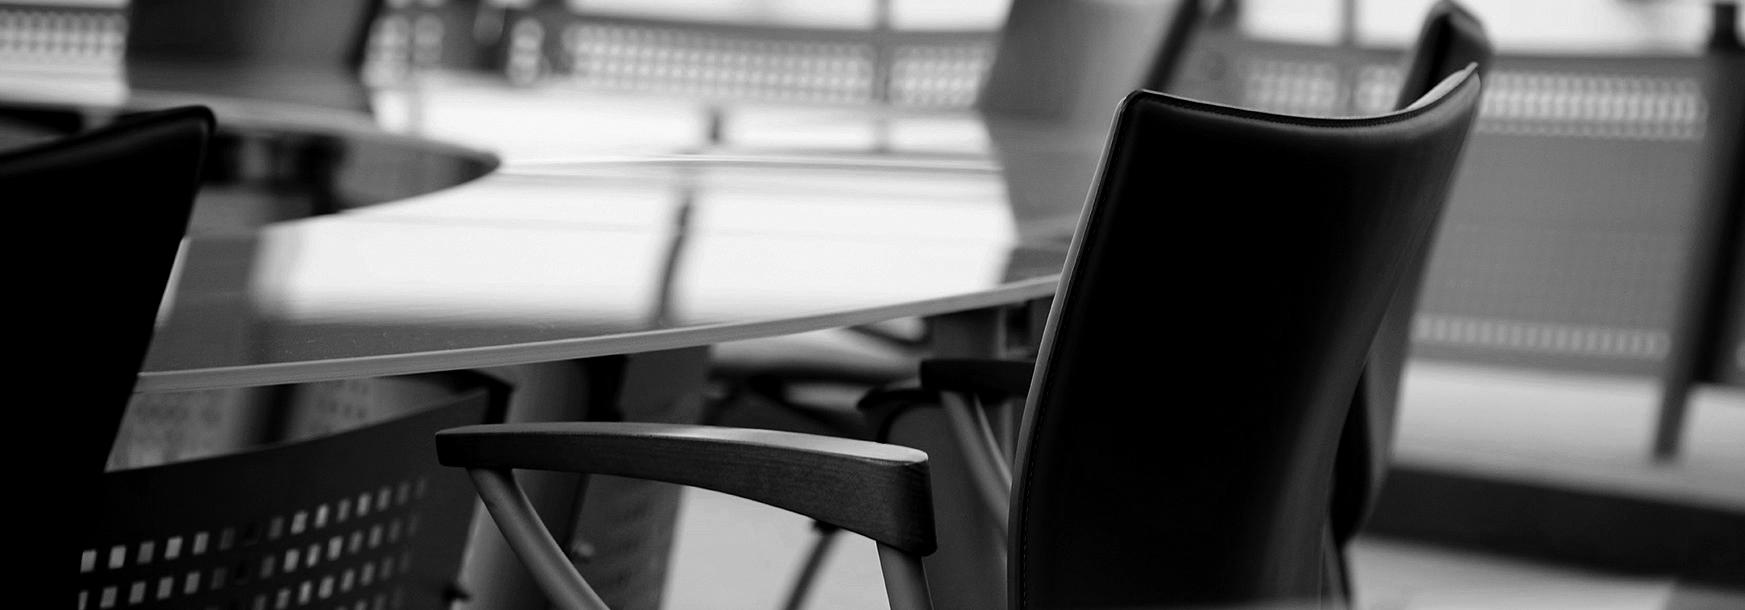 chartered accounta uno chair - 1745×610